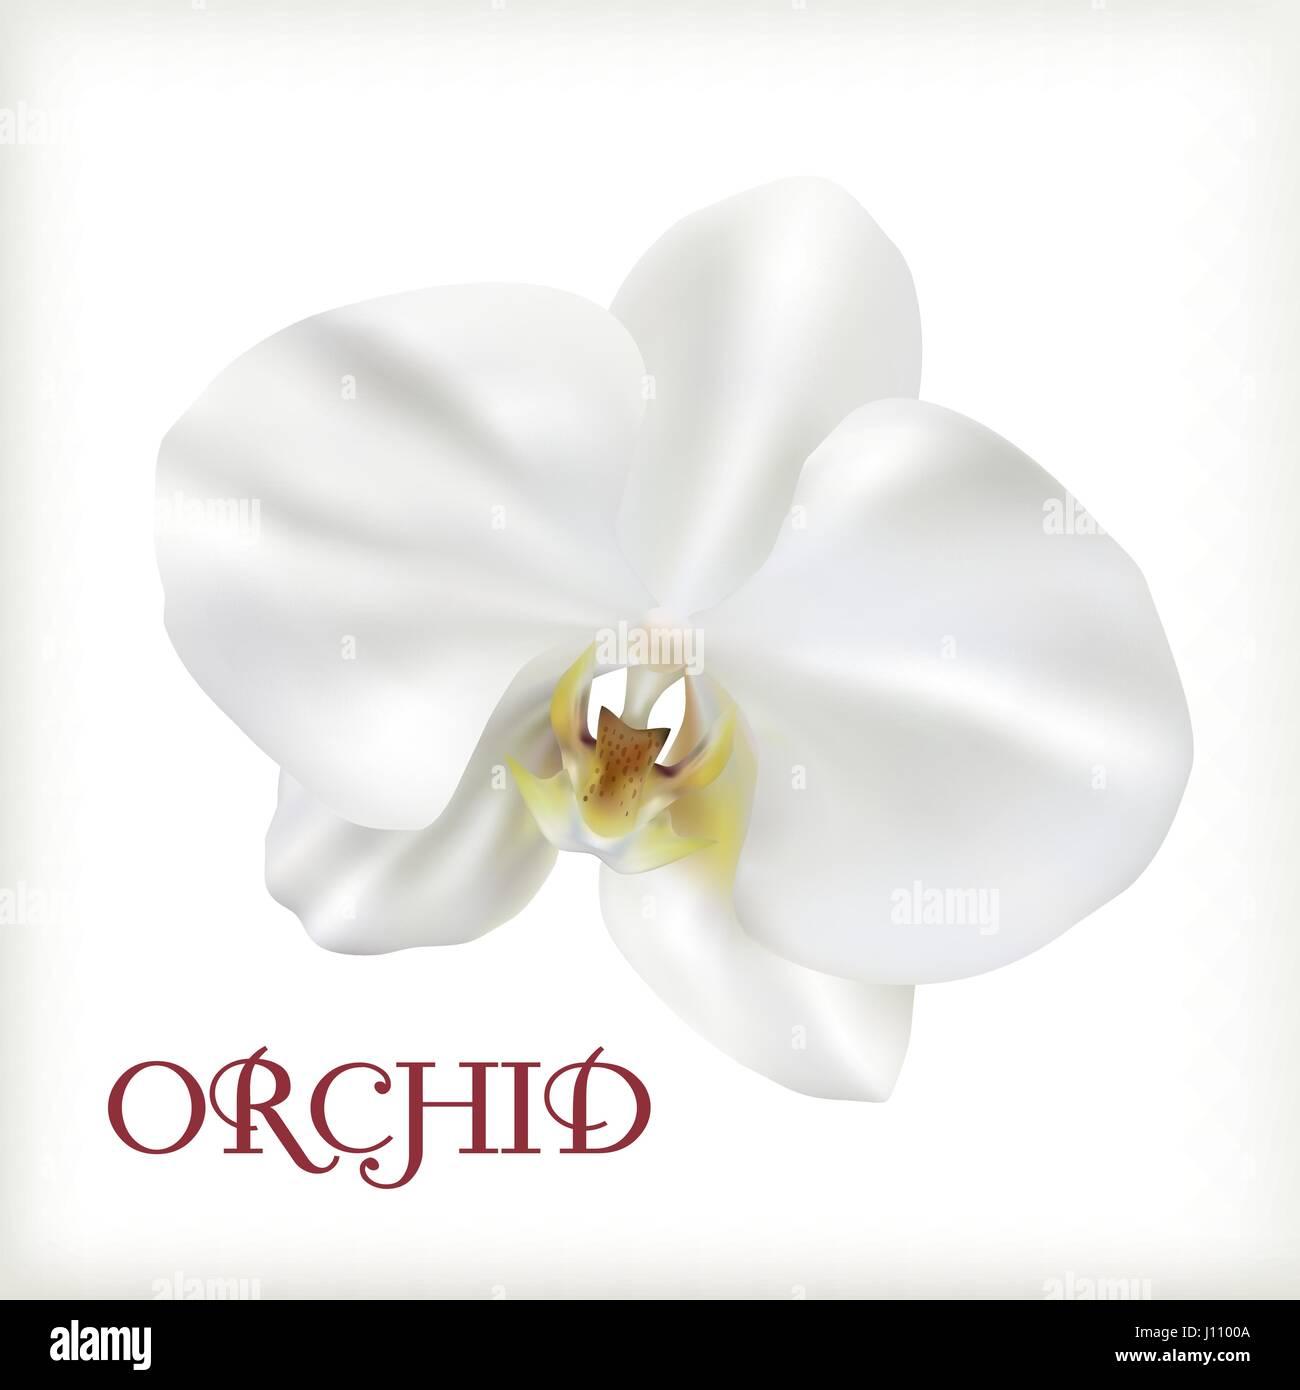 Flower symbol orchid plant stock photos flower symbol orchid plant white flower orchid stock image mightylinksfo